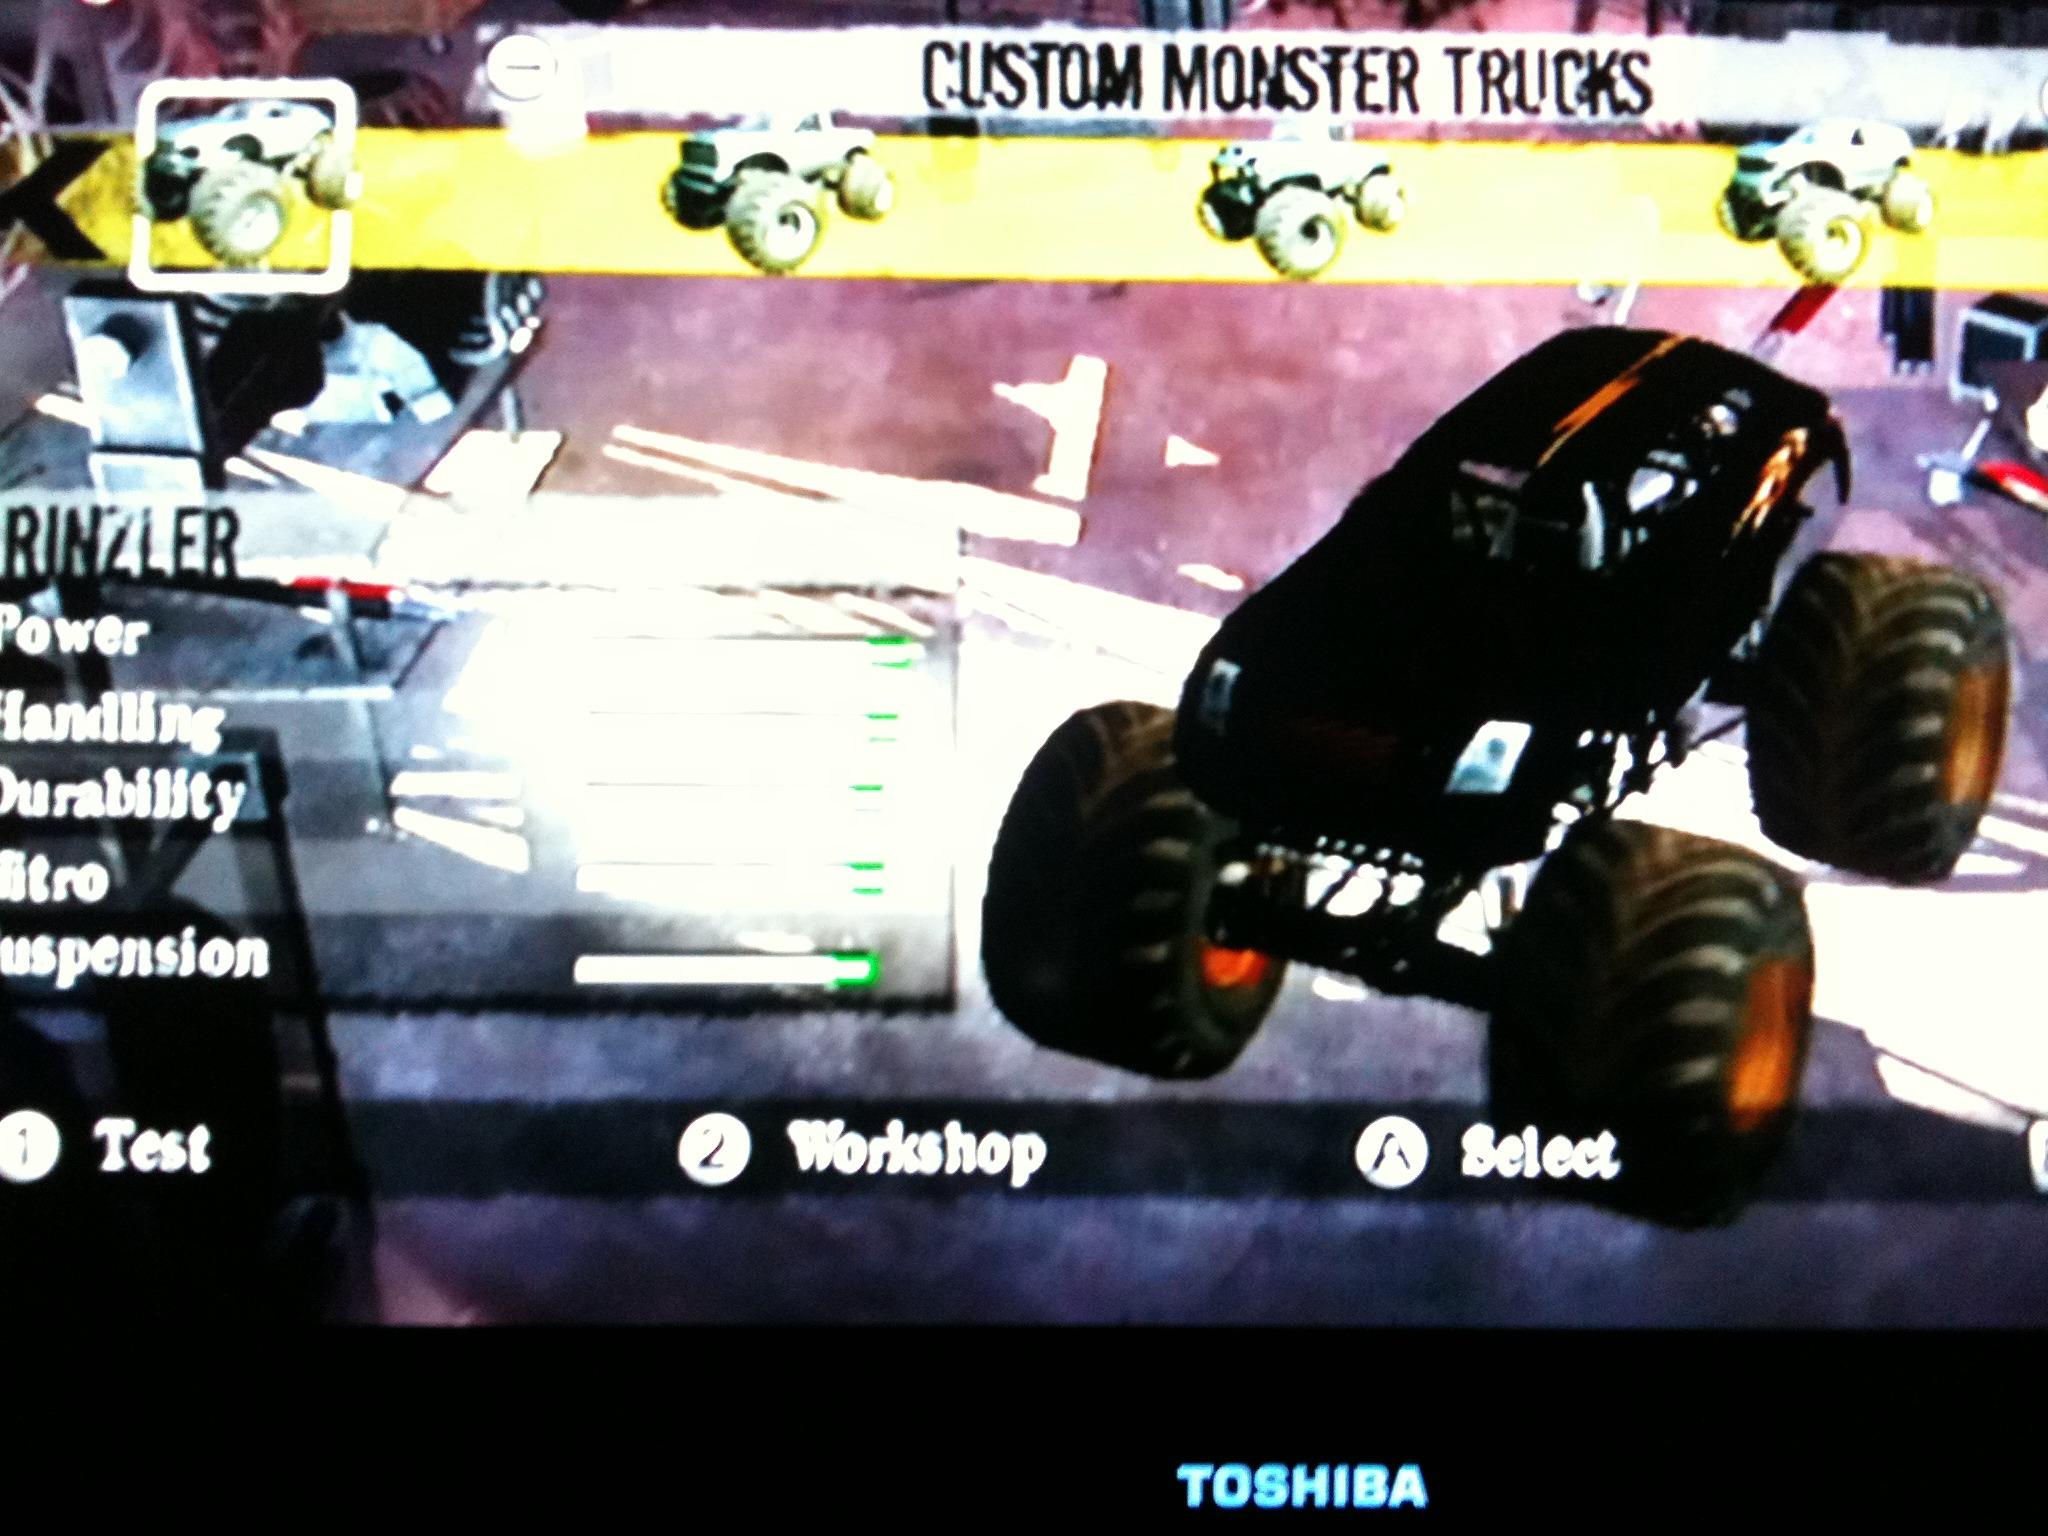 The boy customized some Monster Jam trucks: Rinzler, Tron, and C.L.U.